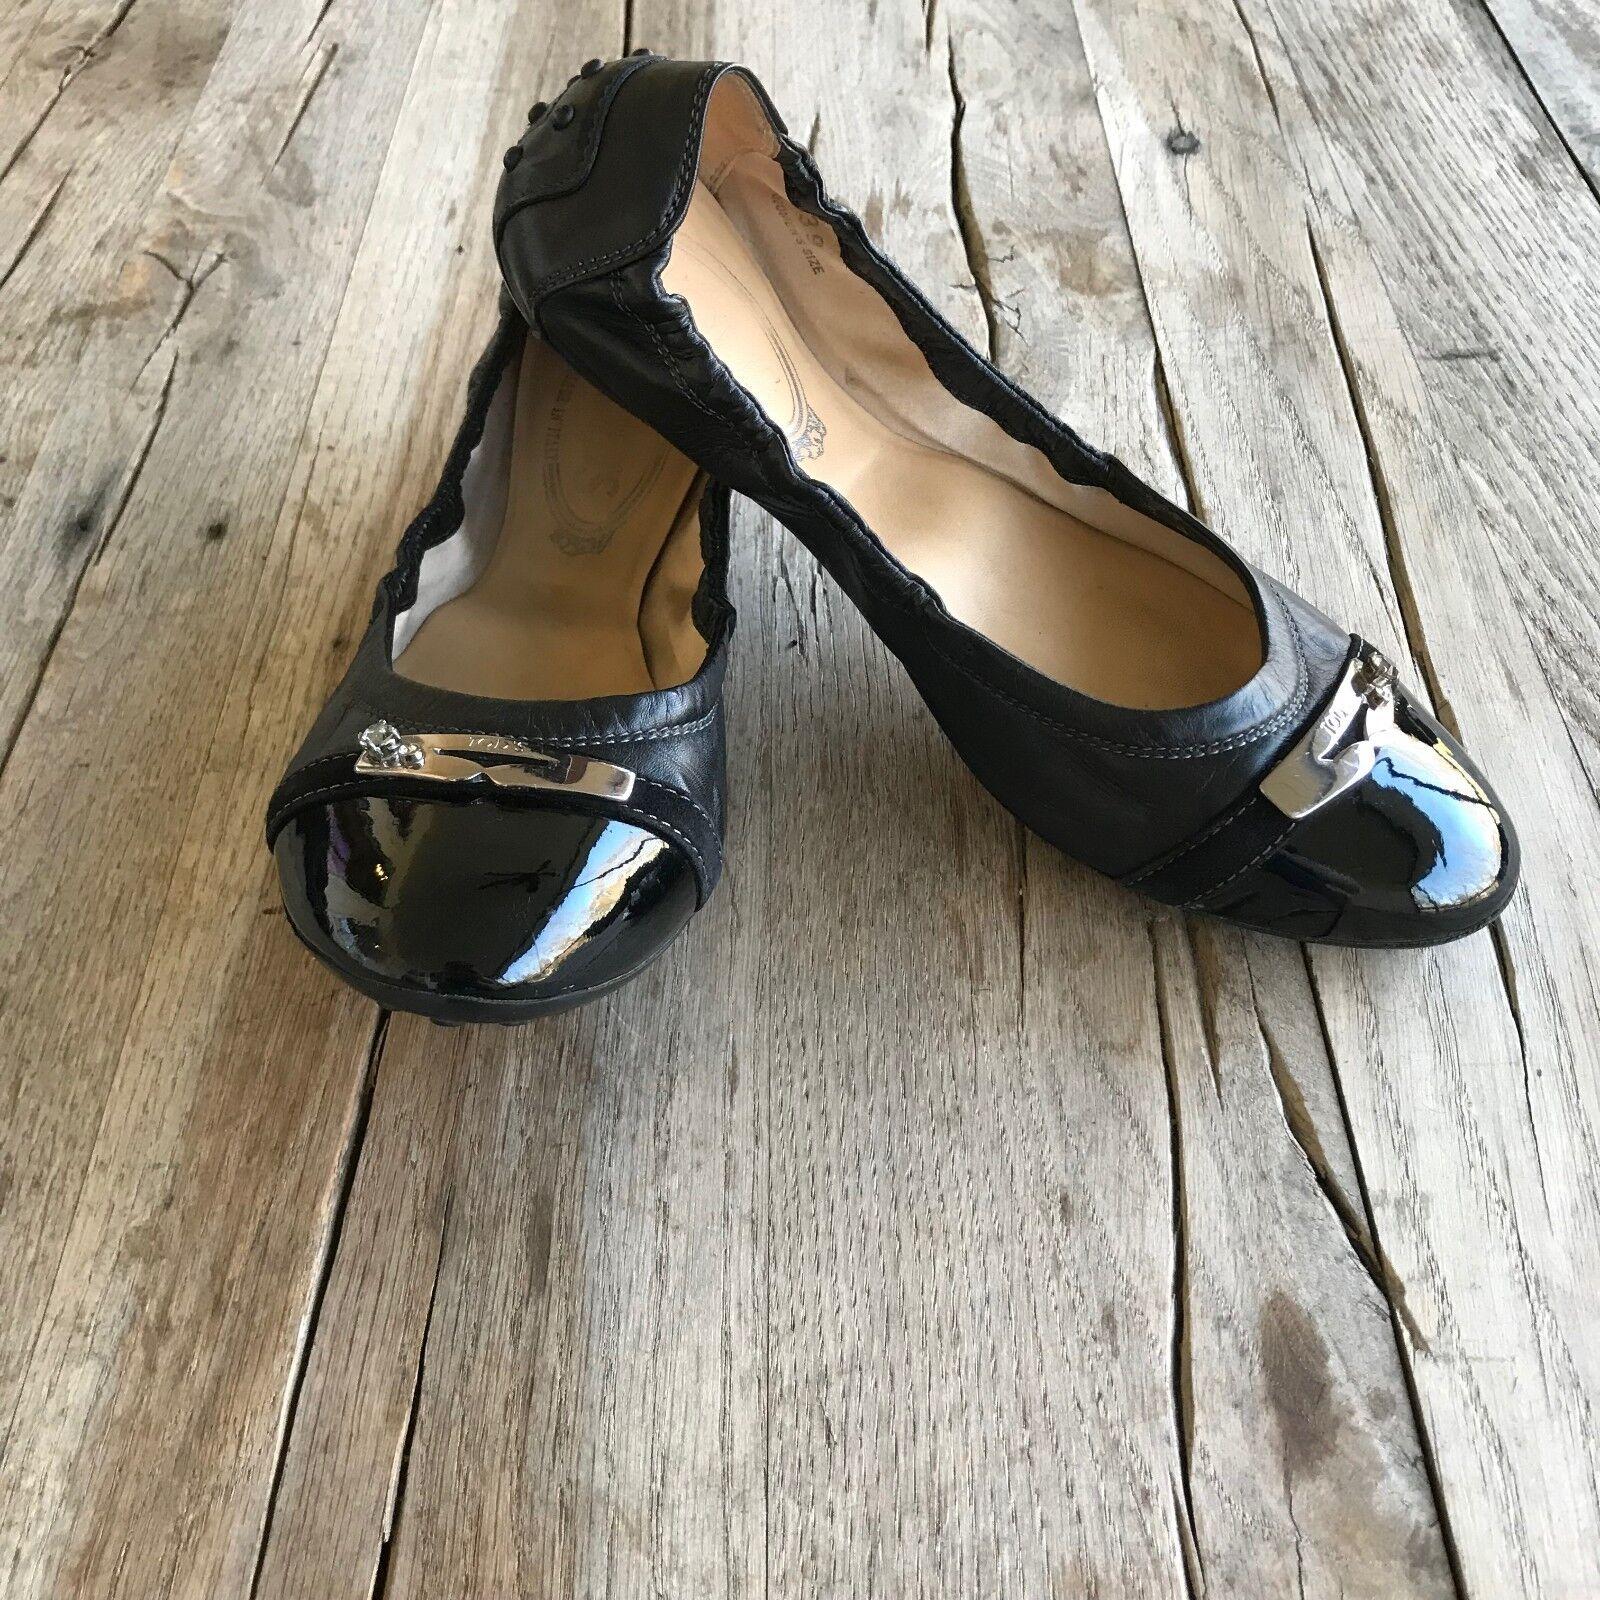 Tod's Damenss ballet flats, schwarz, patent silver/rhinestone accent , patent schwarz, toe, 39/US 9 9f5e50